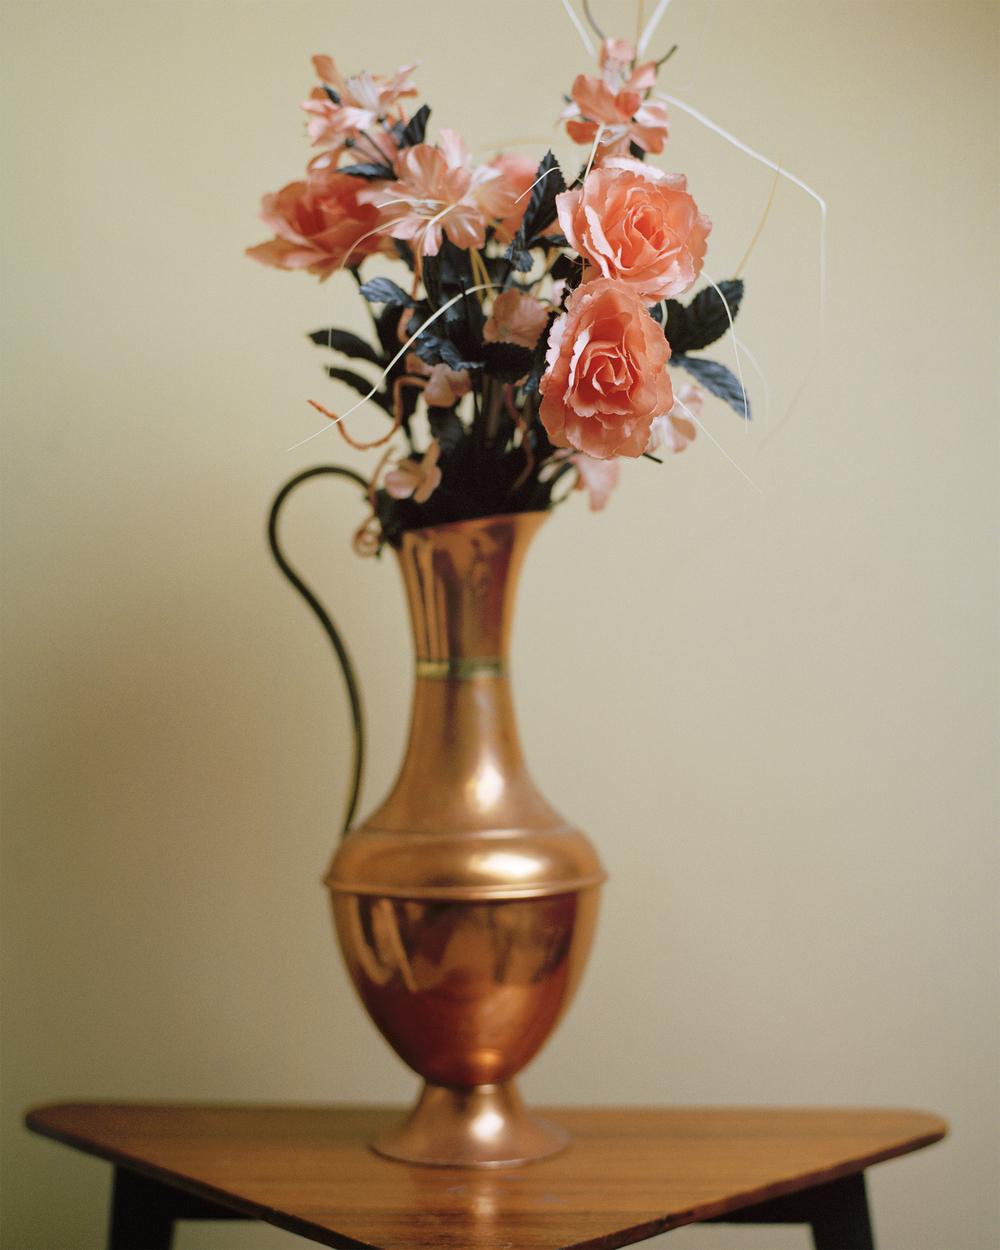 CharlotteRobinson_Flowers.jpg